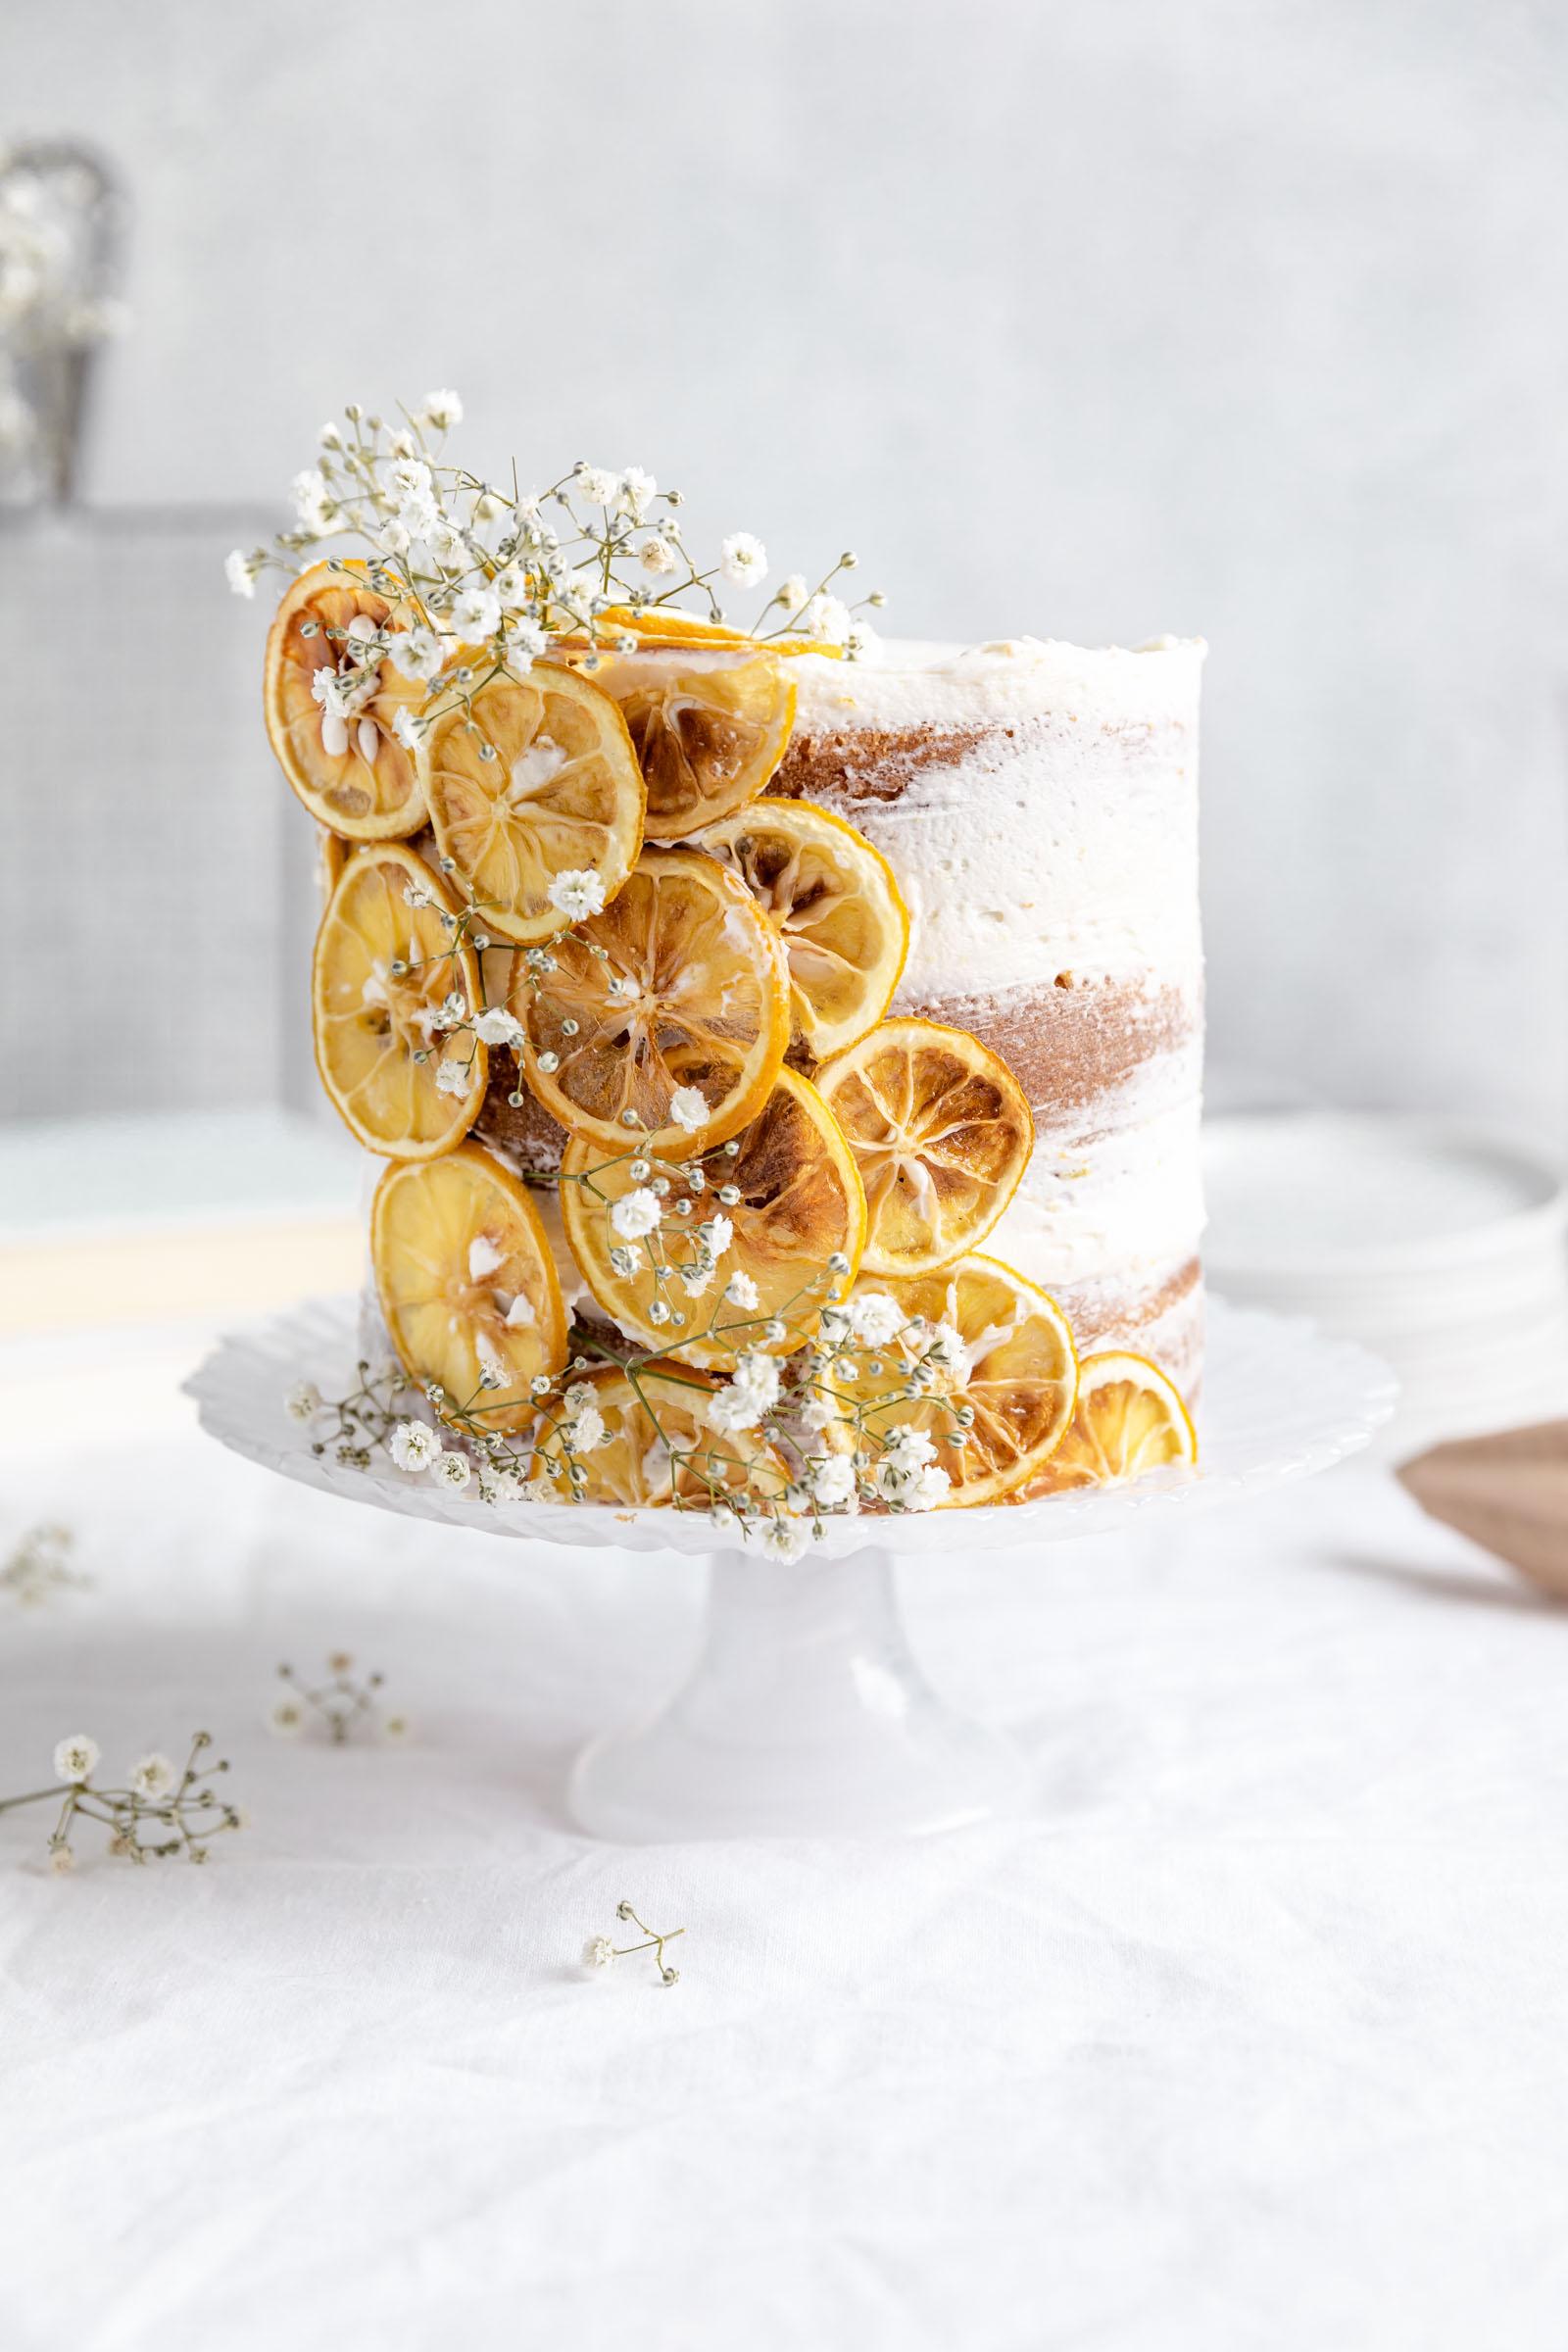 lemon layer cake with lemon garnish